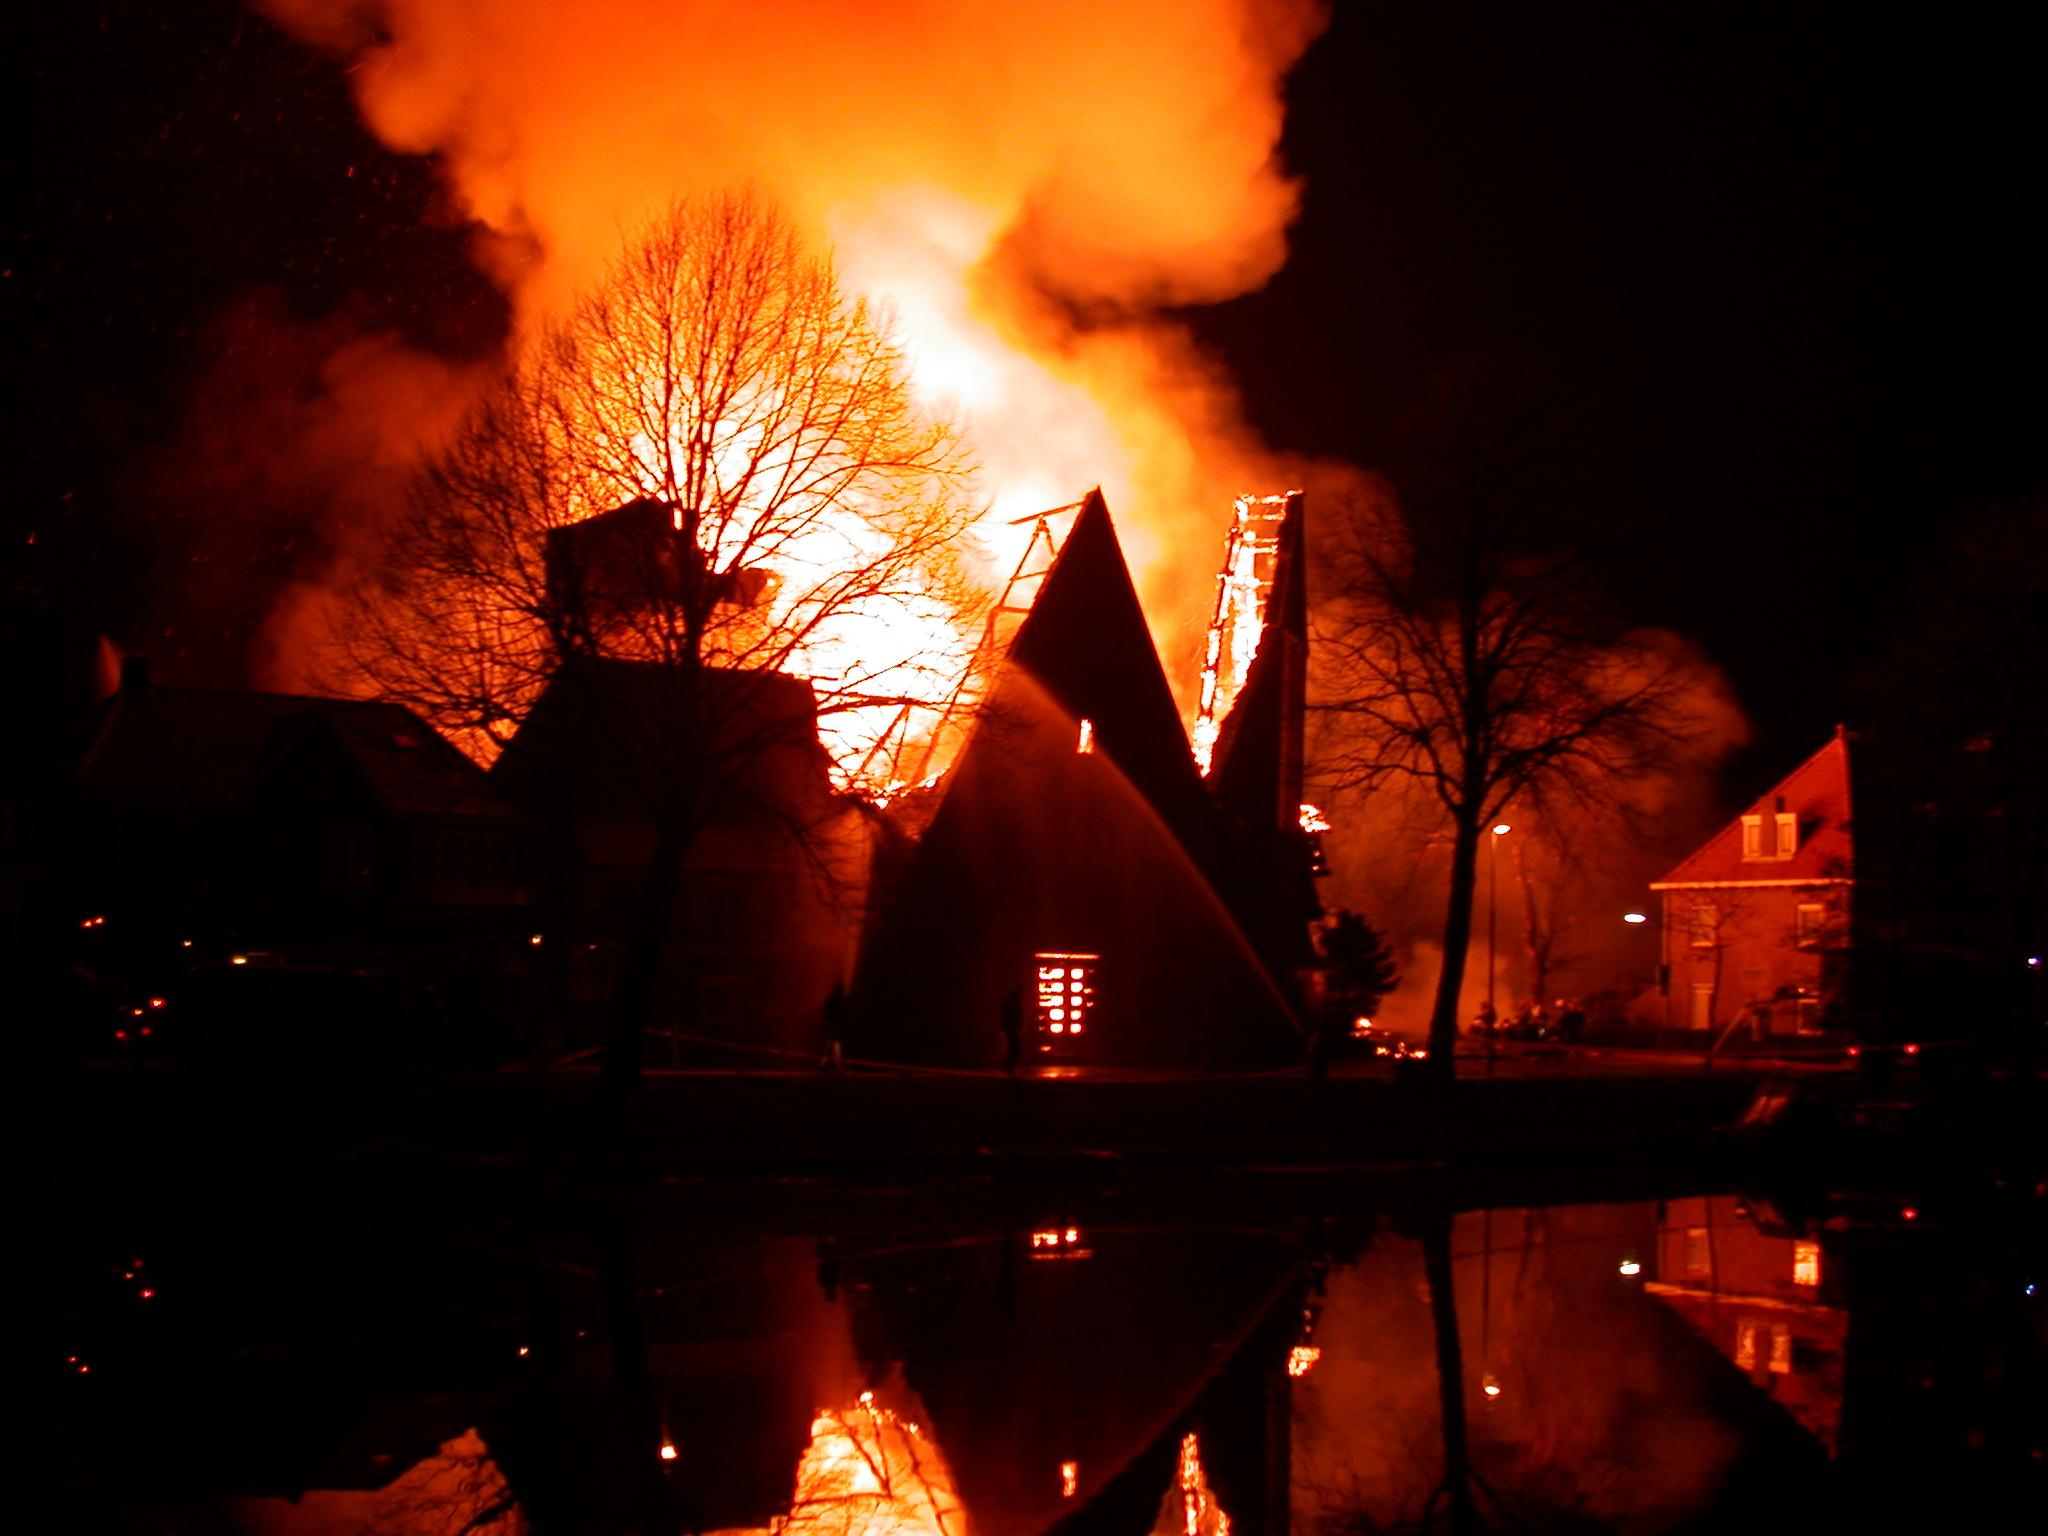 fire flame fireman firemen night flames burn burning dark red orange glow house going up in